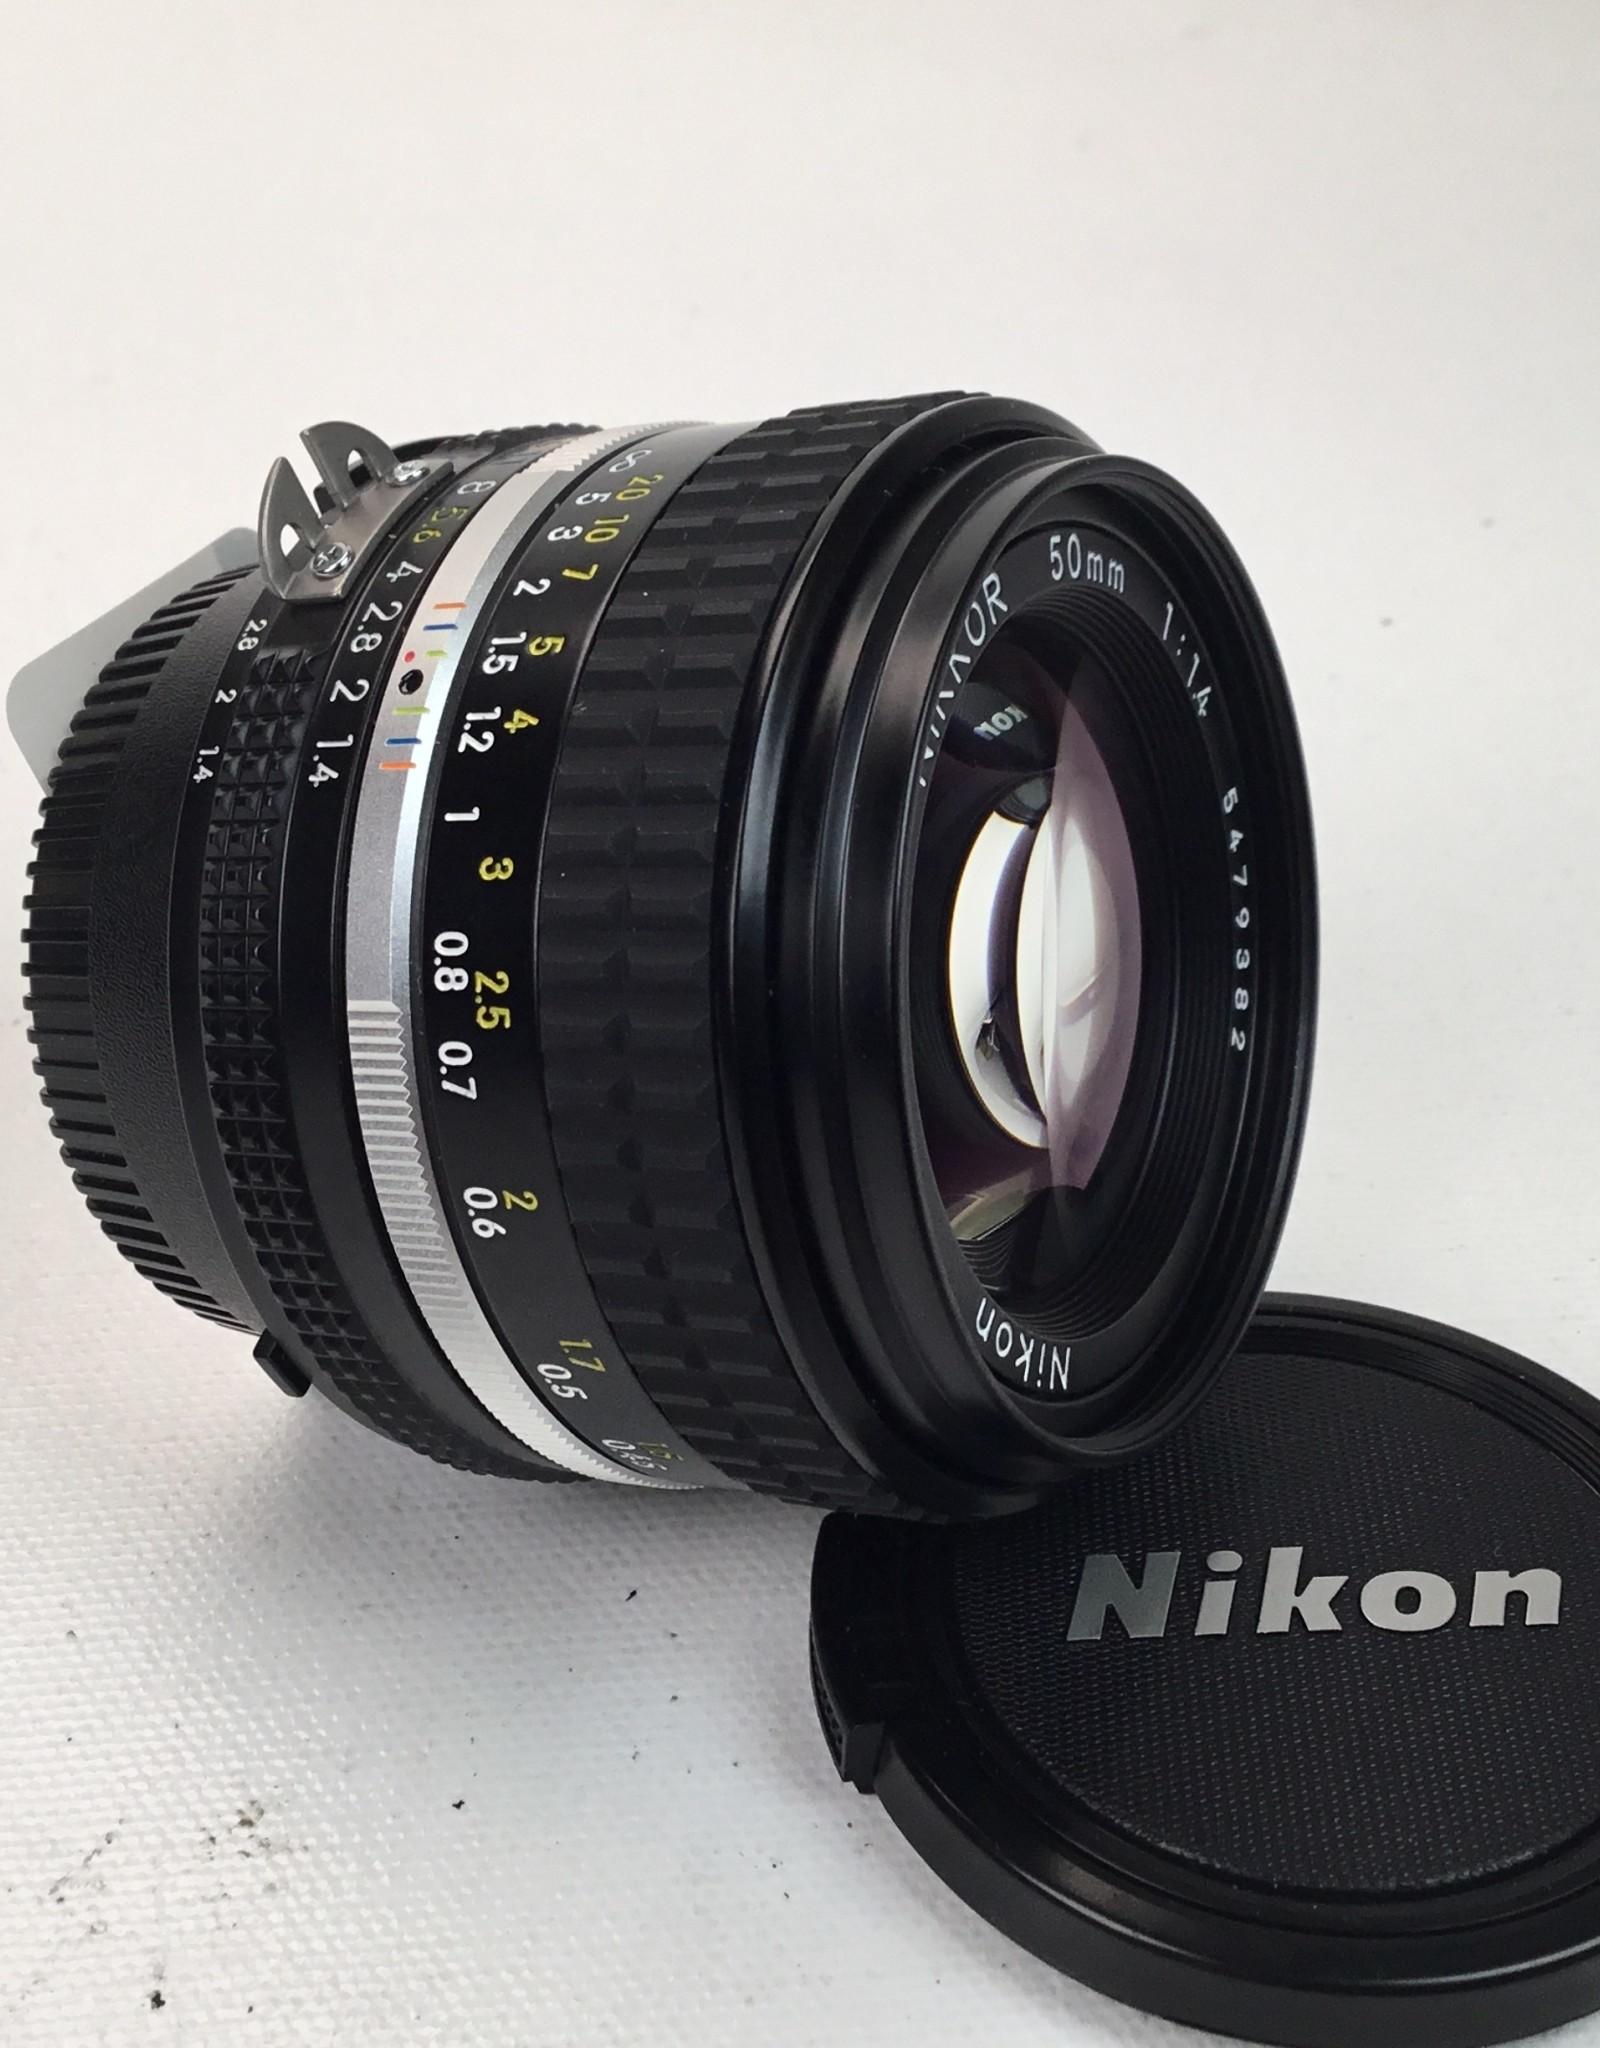 NIKON Nikon Nikkor 50mm 1.4 AIS Lens Used EX+